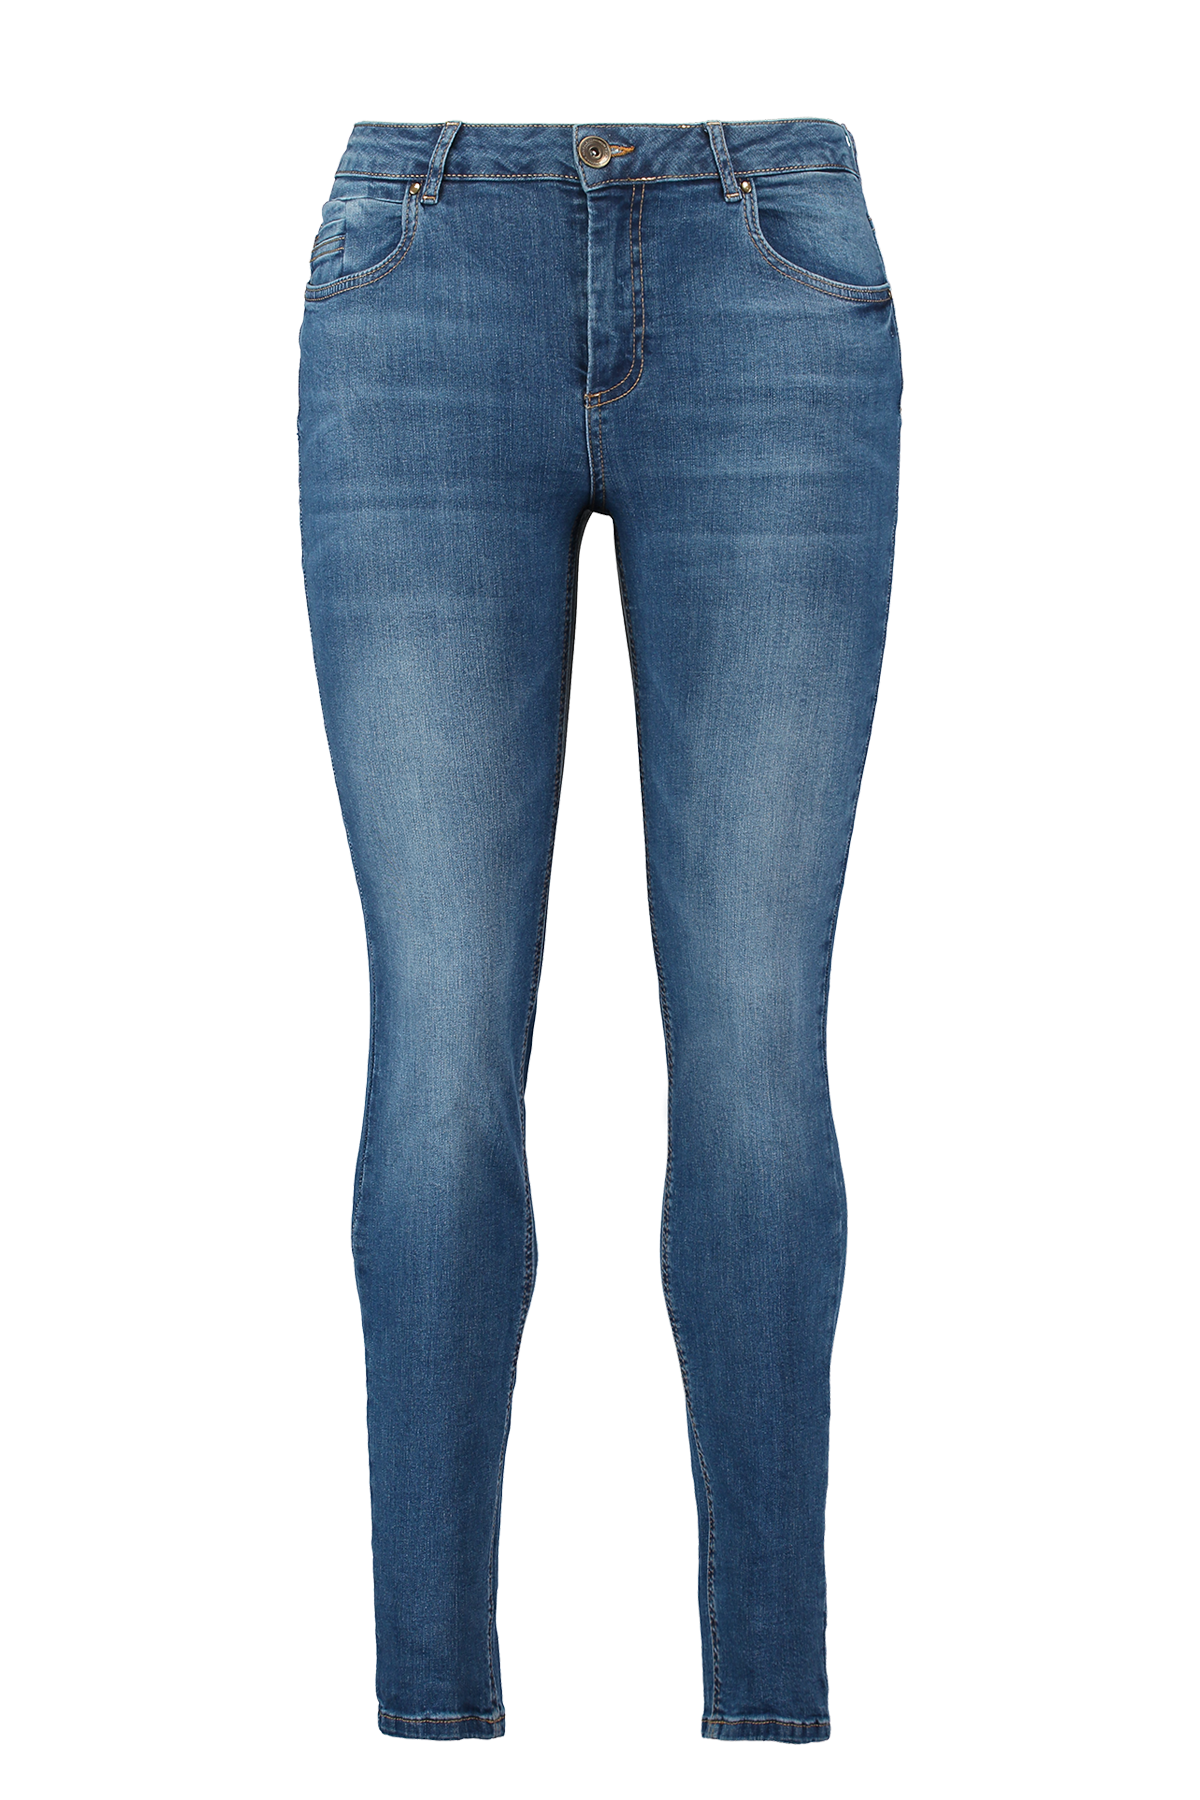 Mode Jeans Slim Denim Leg Iris Ms Dames kXZuwOTiP